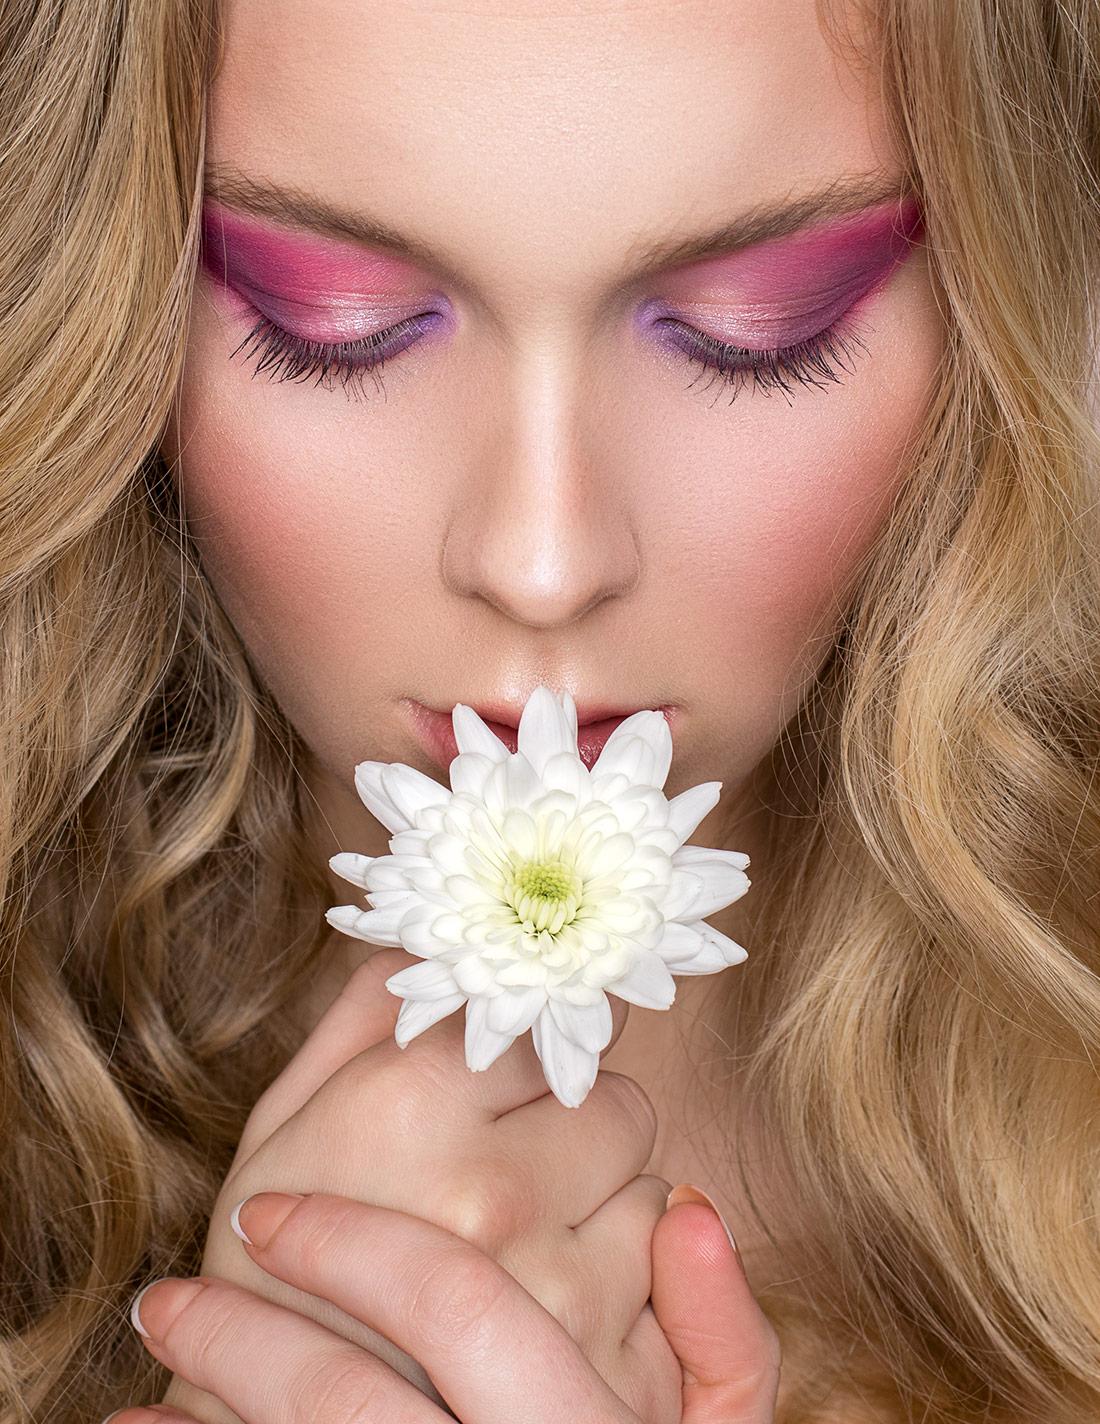 Flower-beauty_5_LR.jpg